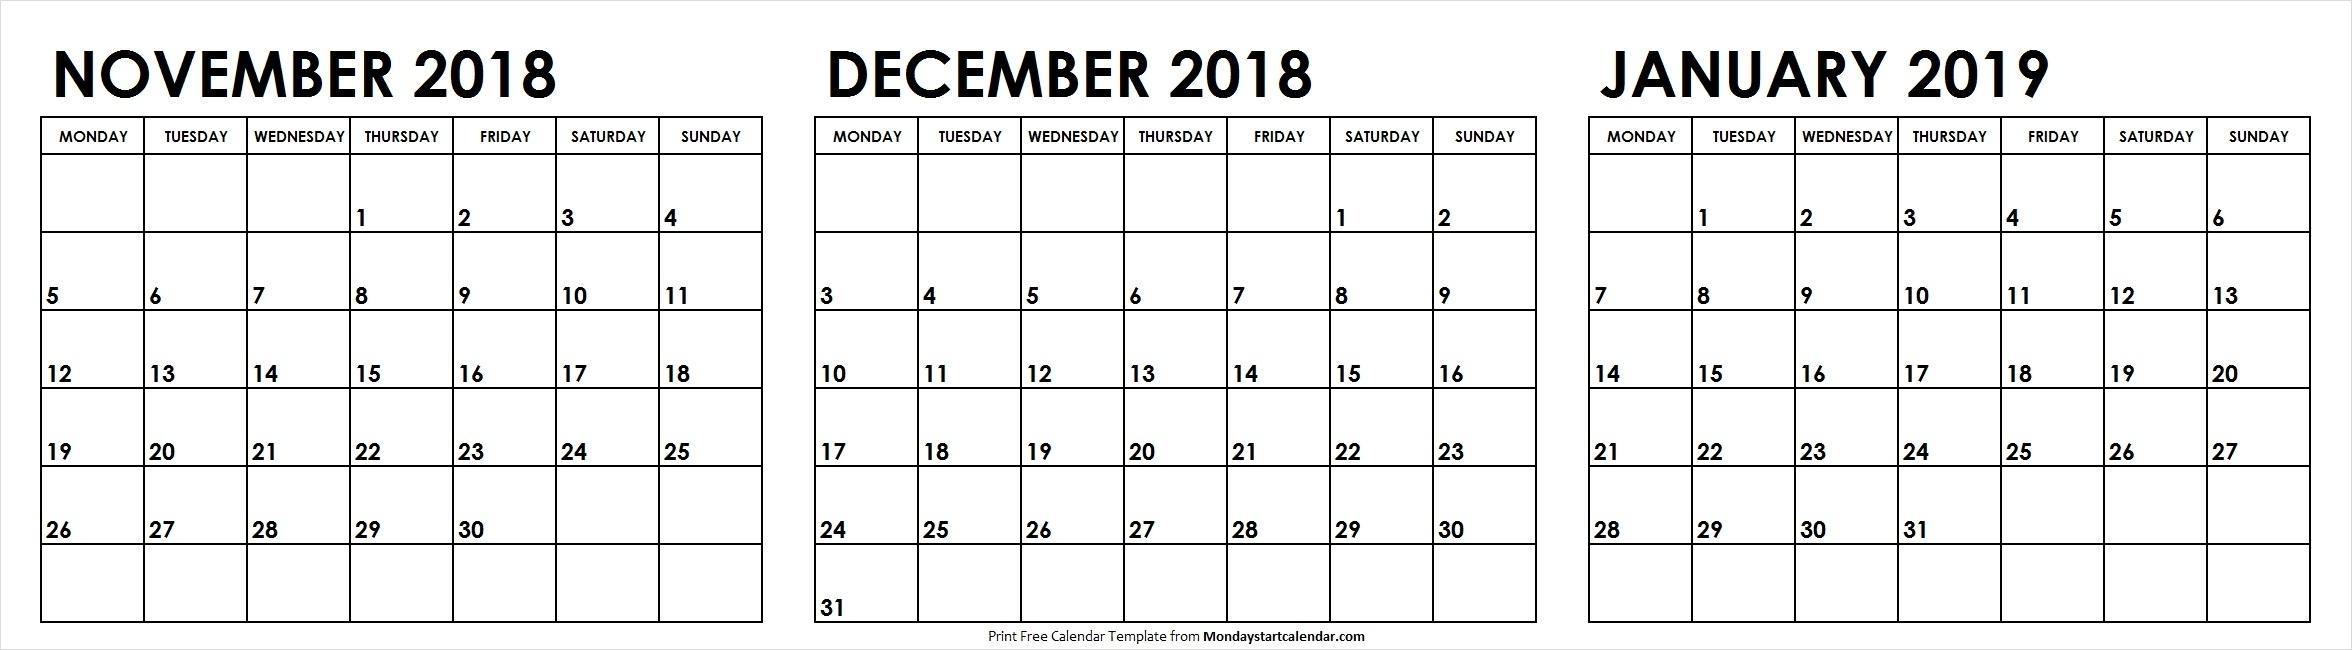 3 Month Calendar November December 2018 January 2019 Template